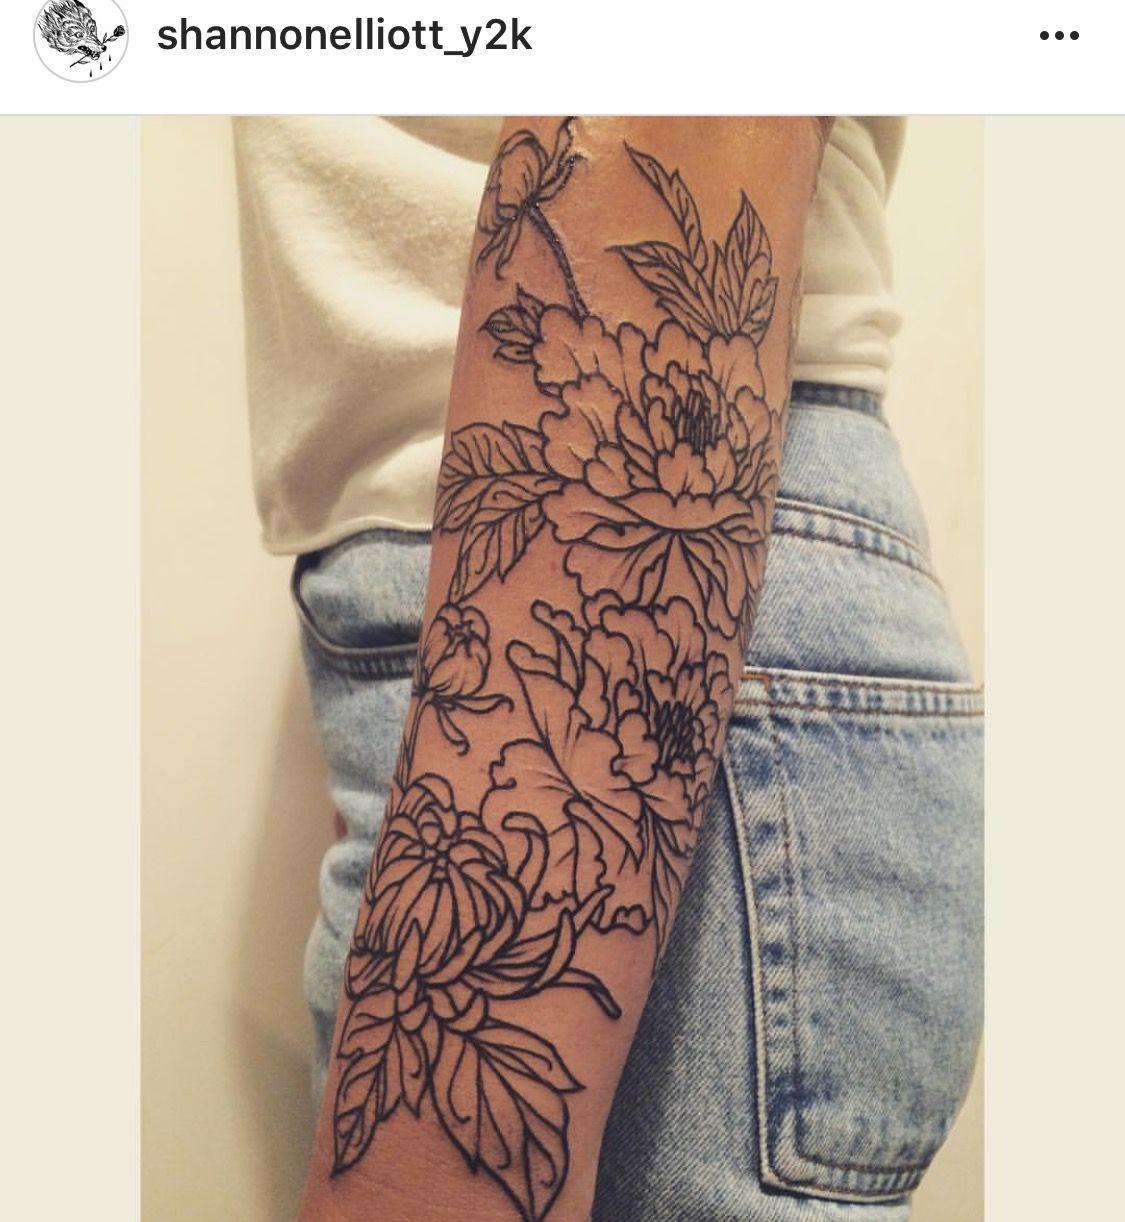 Lower Tattoo Sleeve: Tattoos, Forearm Tattoo Design